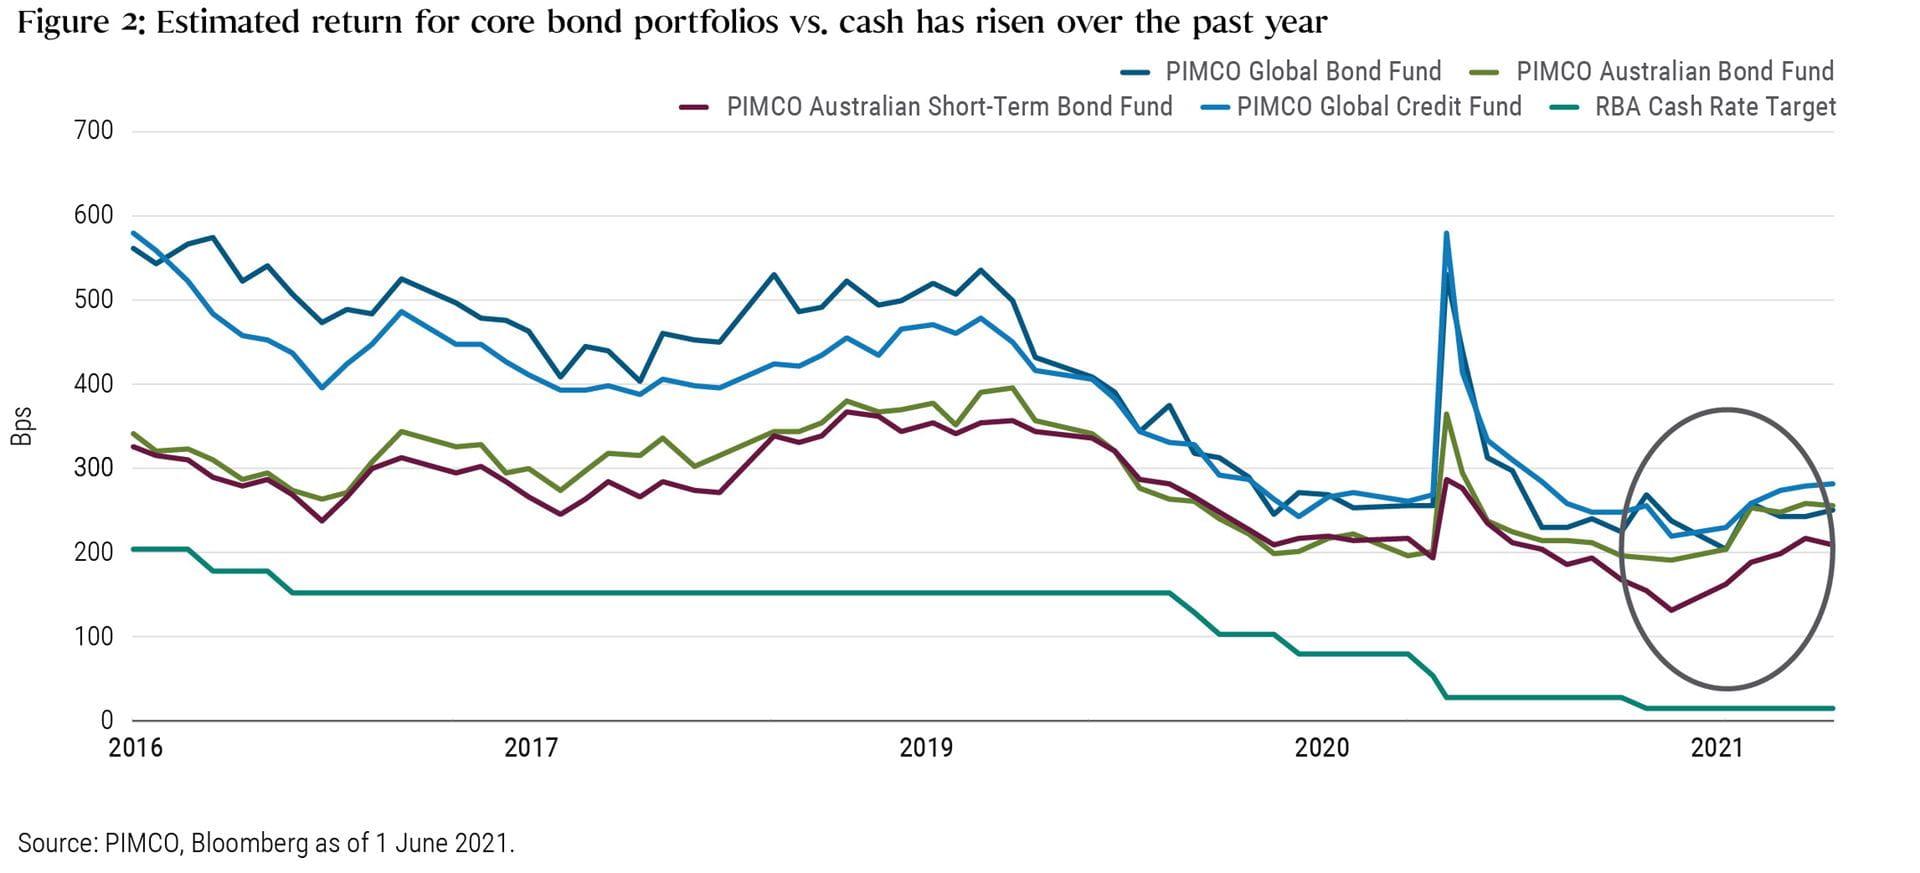 Figure 2: Estimated return for core bond portfolios vs. cash has risen over the past year